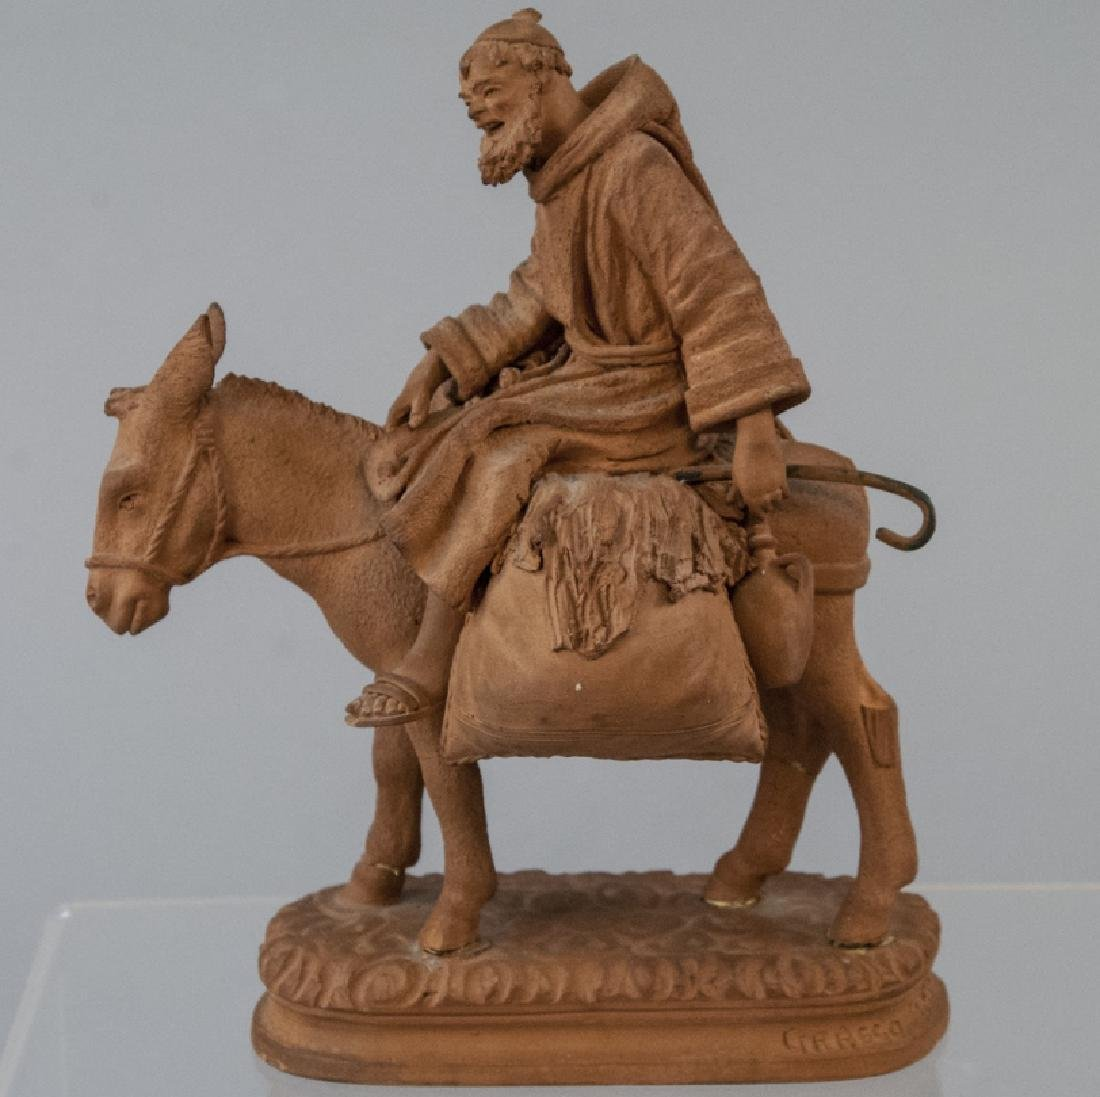 Signed Grasso Handmade Terracotta Statue